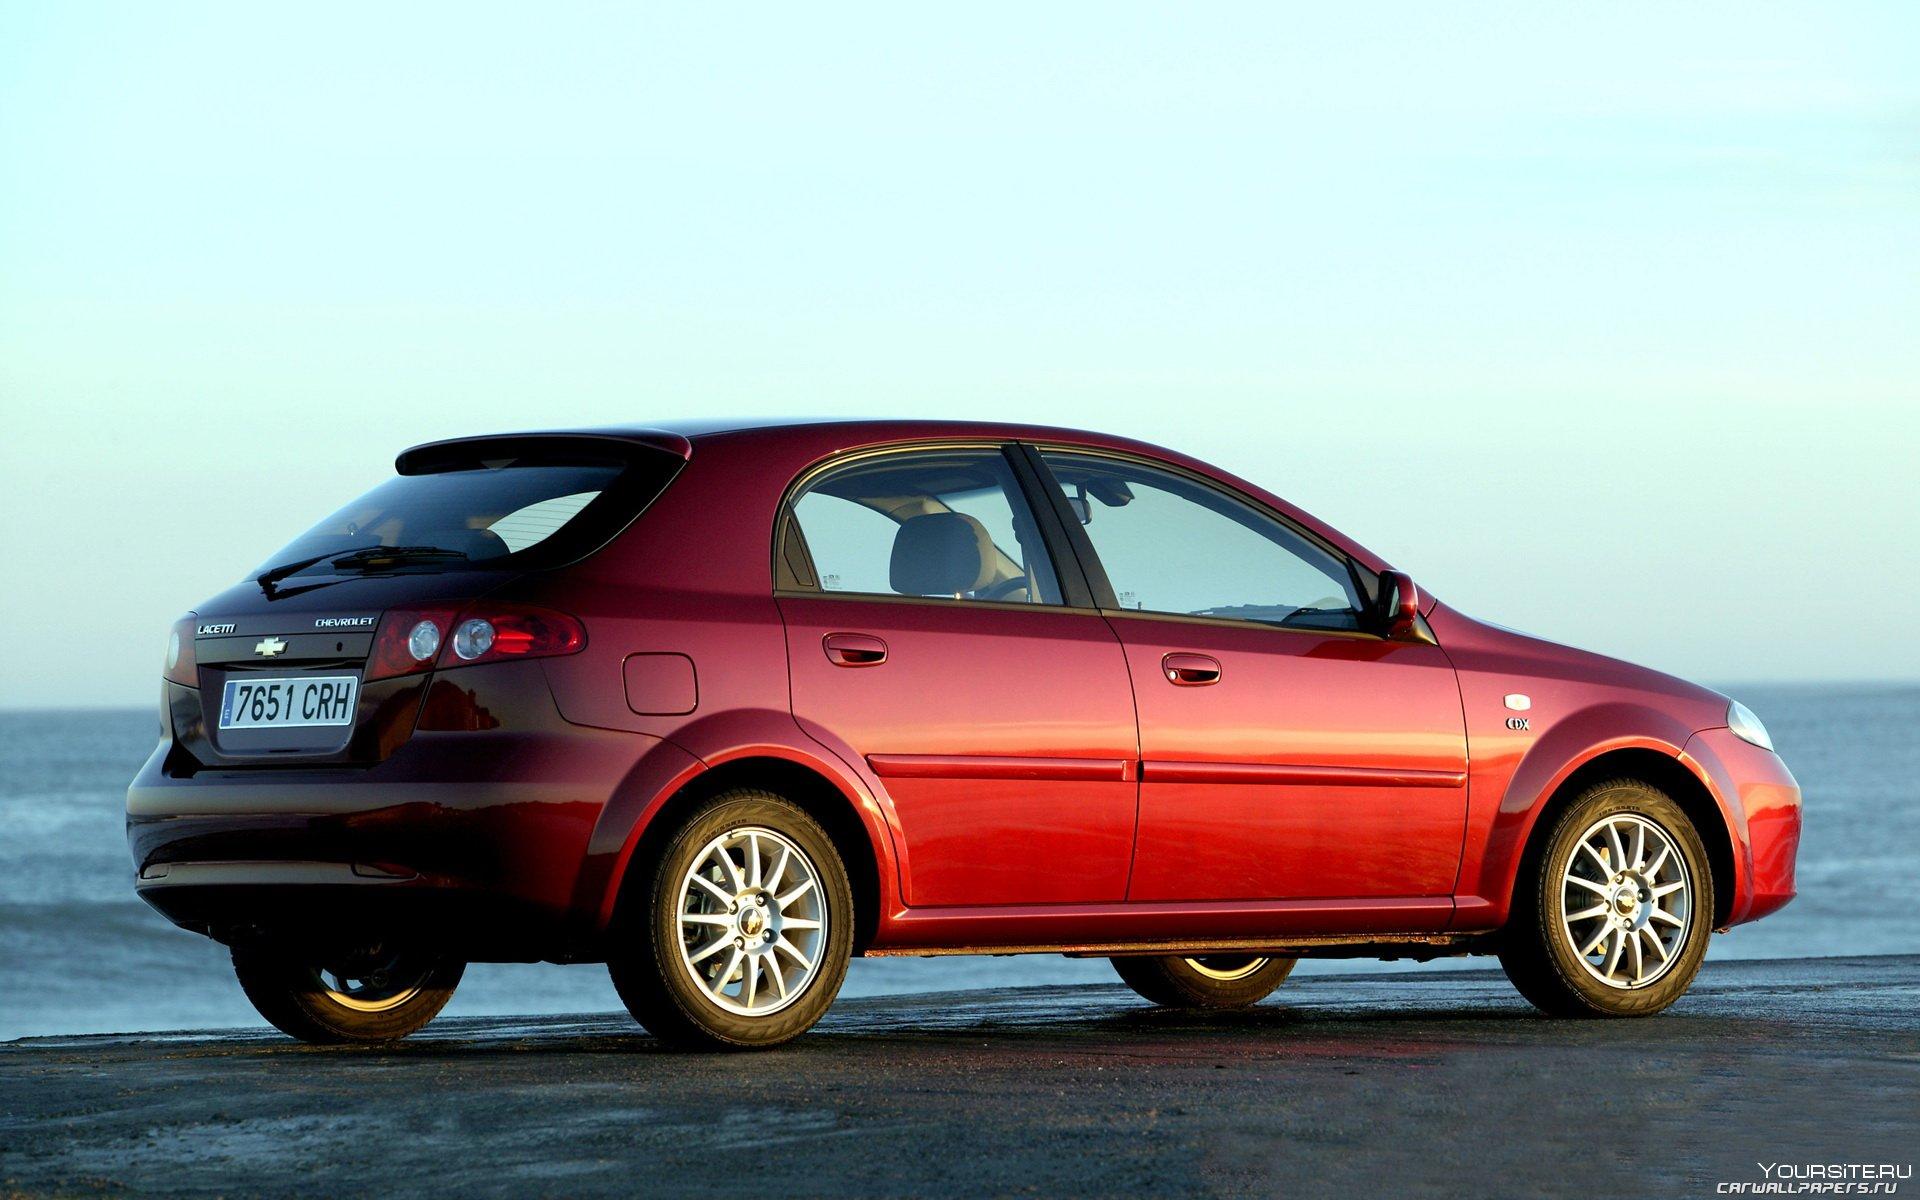 Как узнать комплектацию Chevrolet Lacetti по индексу?